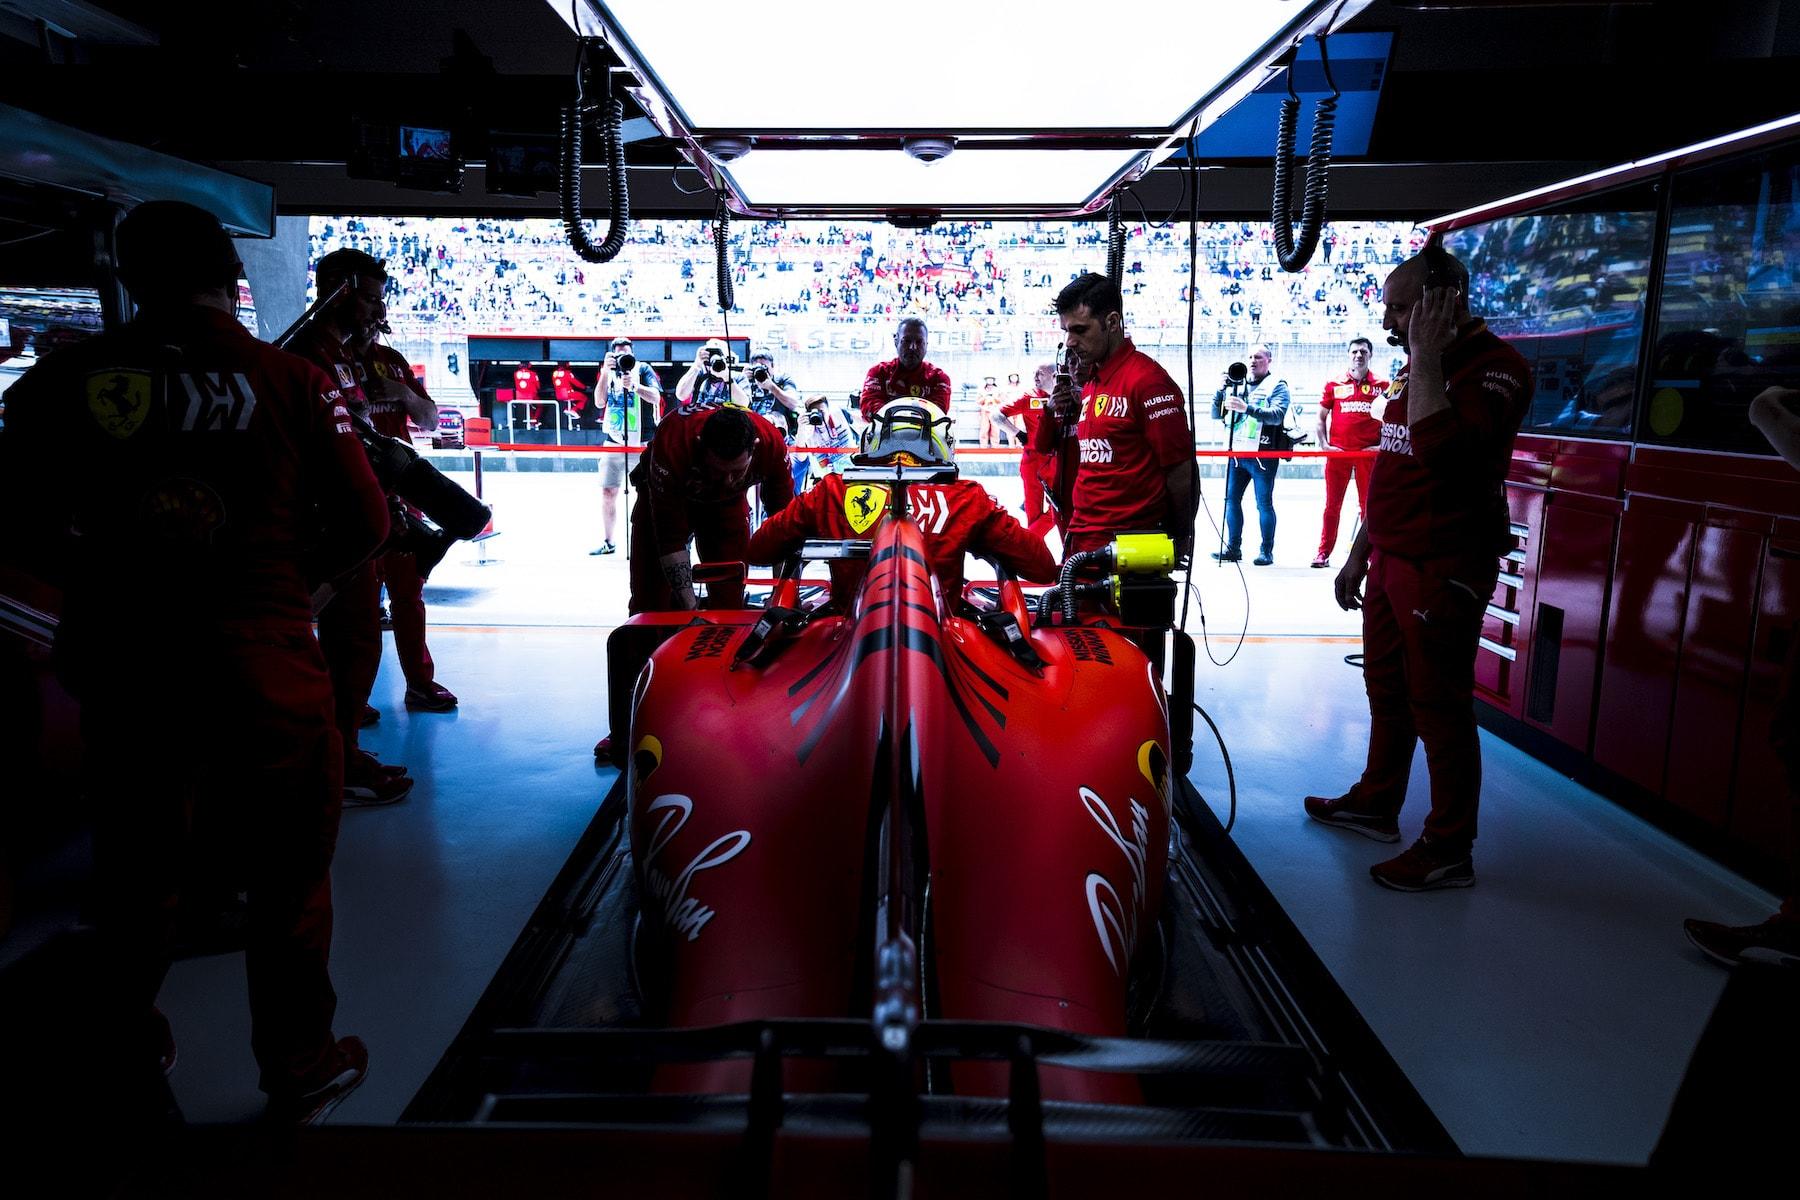 2 2019 Sebastian Vettel | Ferrari SF90 | 2019 Chinese GP Q 3 copy.jpg